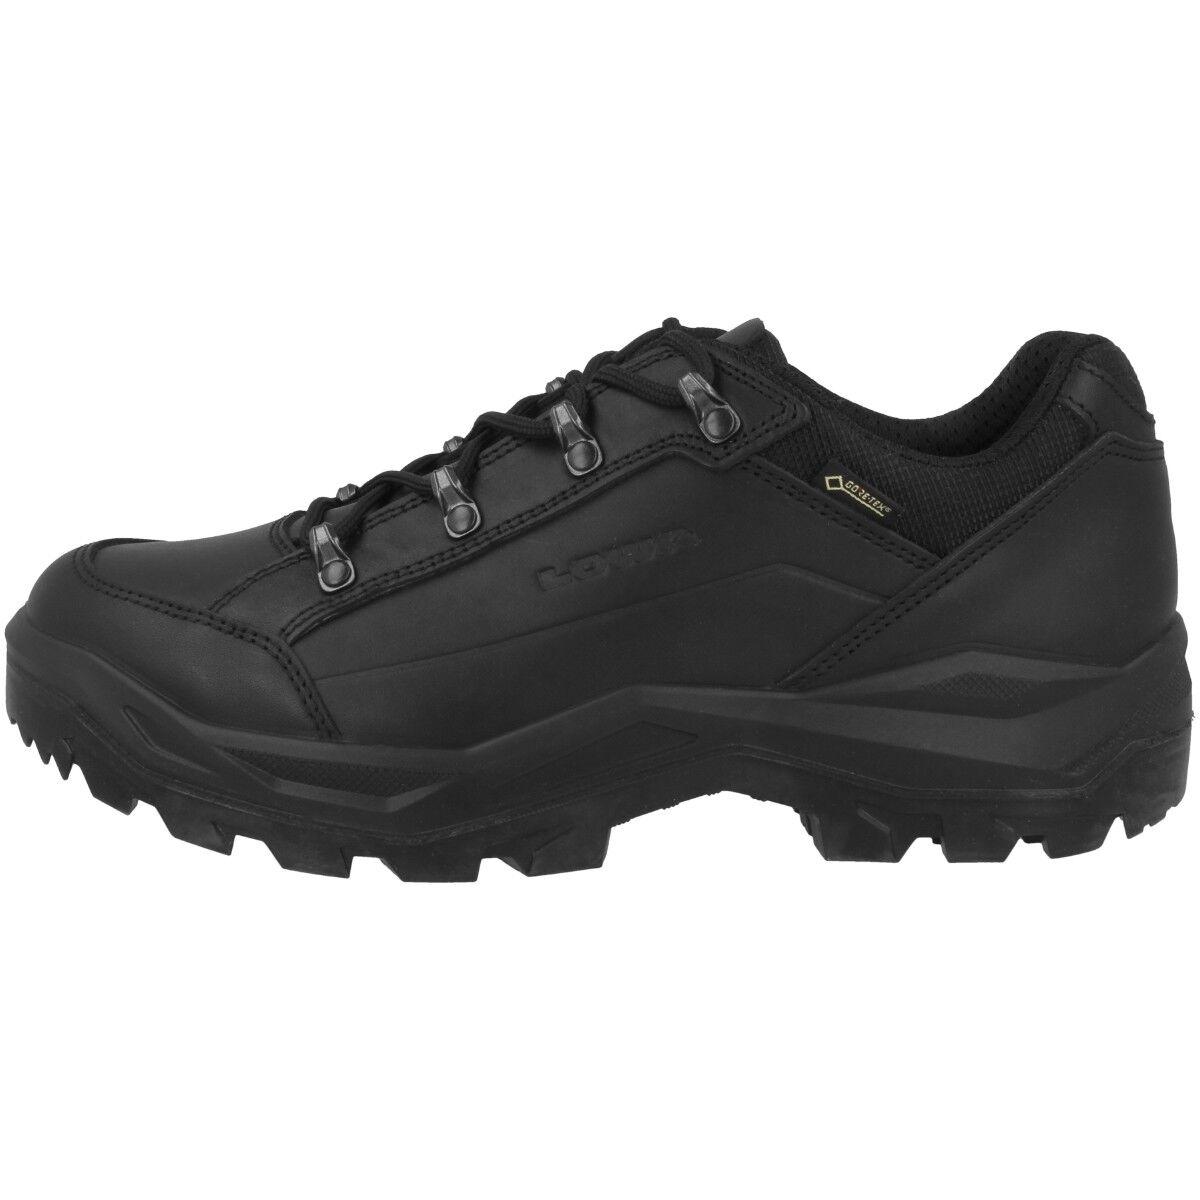 Lowa Renegade II GTX Lo Task Force Men Gore-Tex Outdoor Low shoes 310904-9999